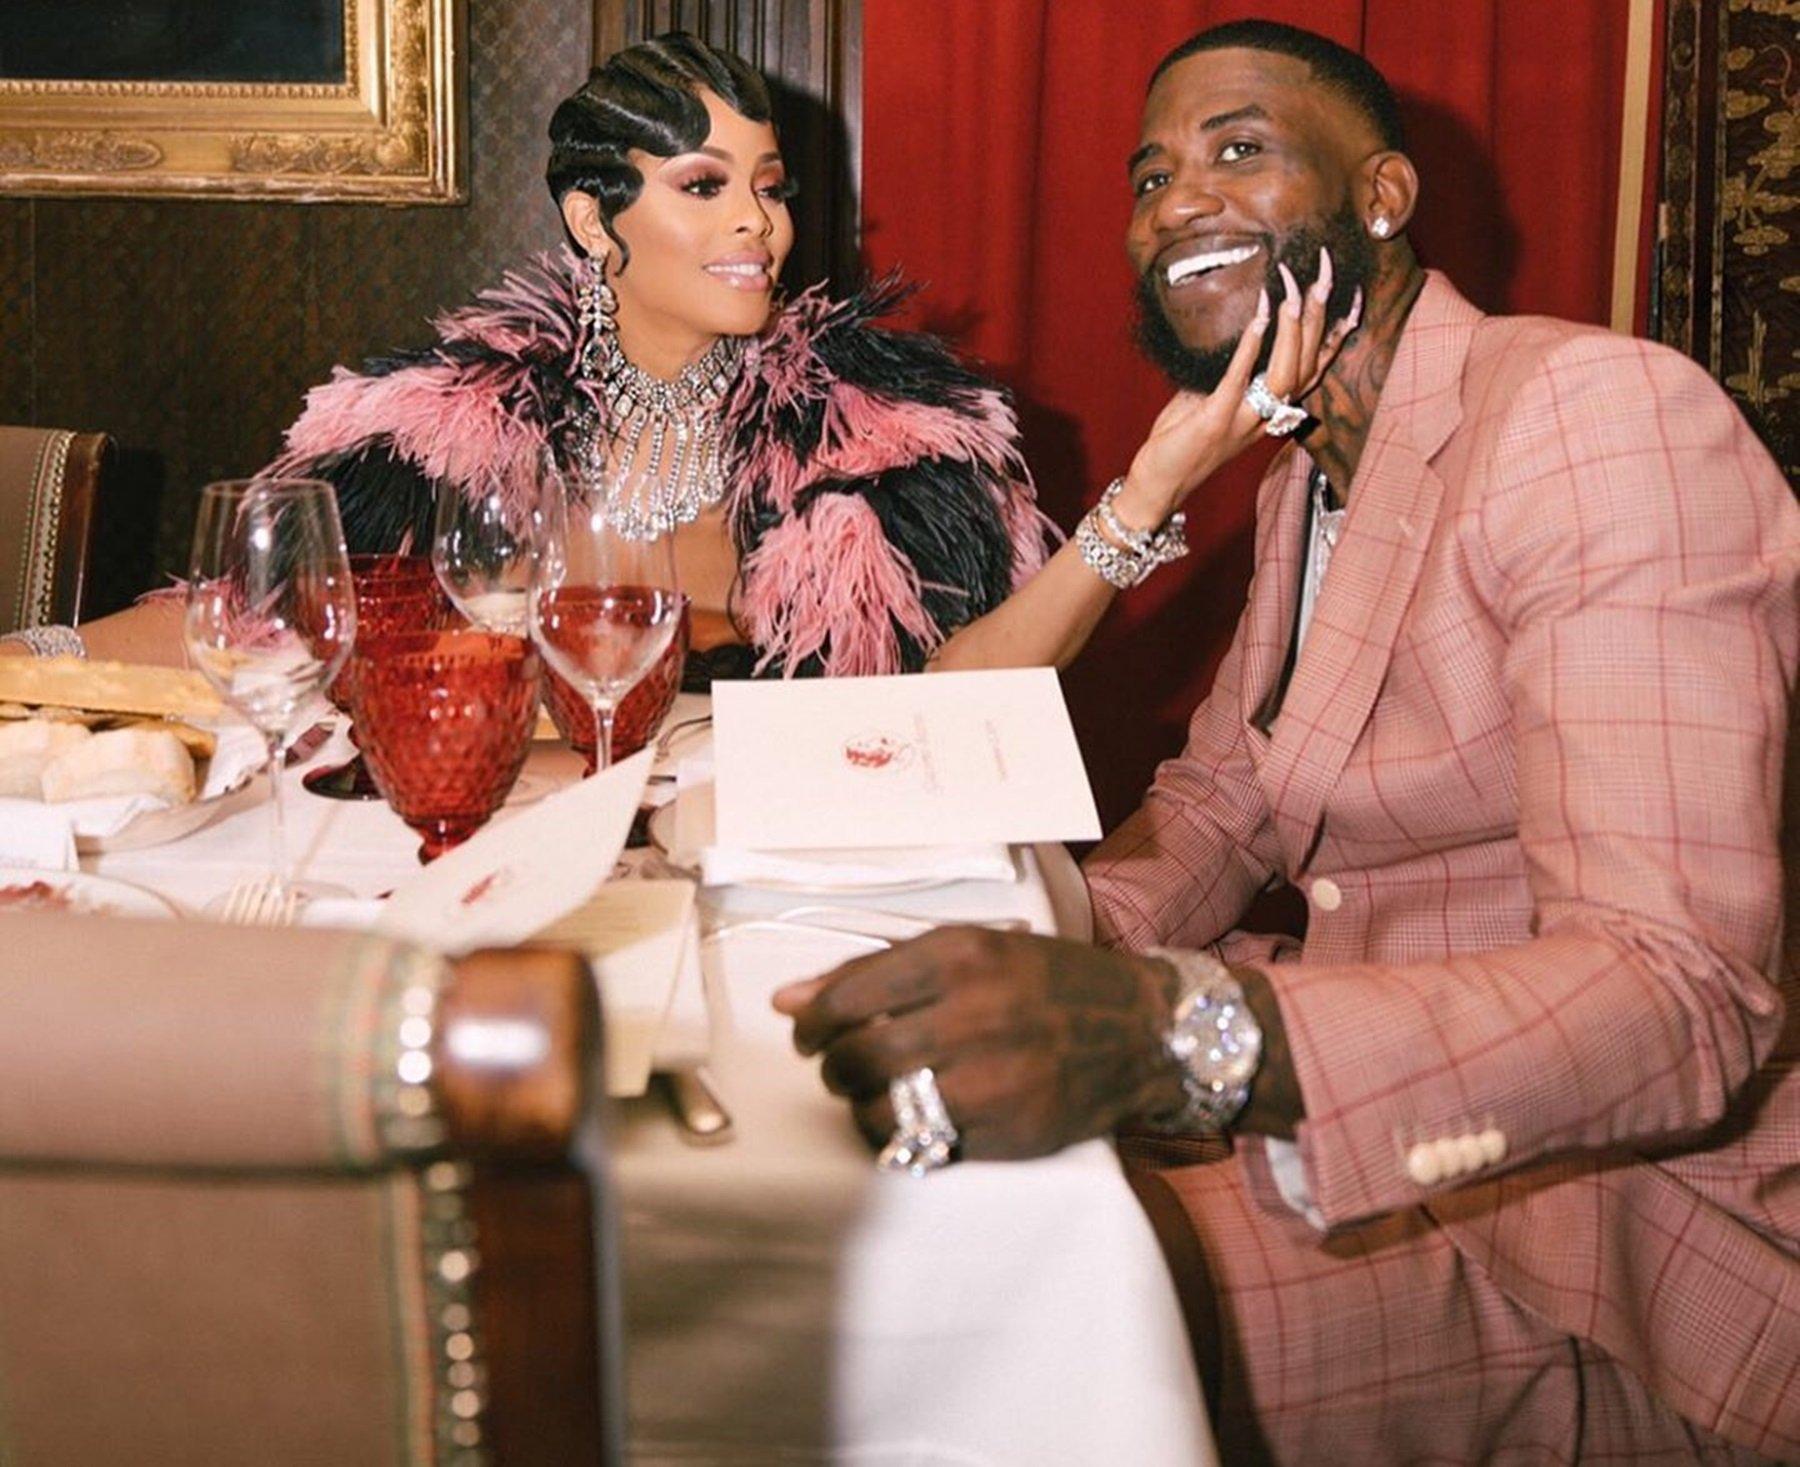 Keyshia Ka'oir Gucci Mane Snoop Dogg